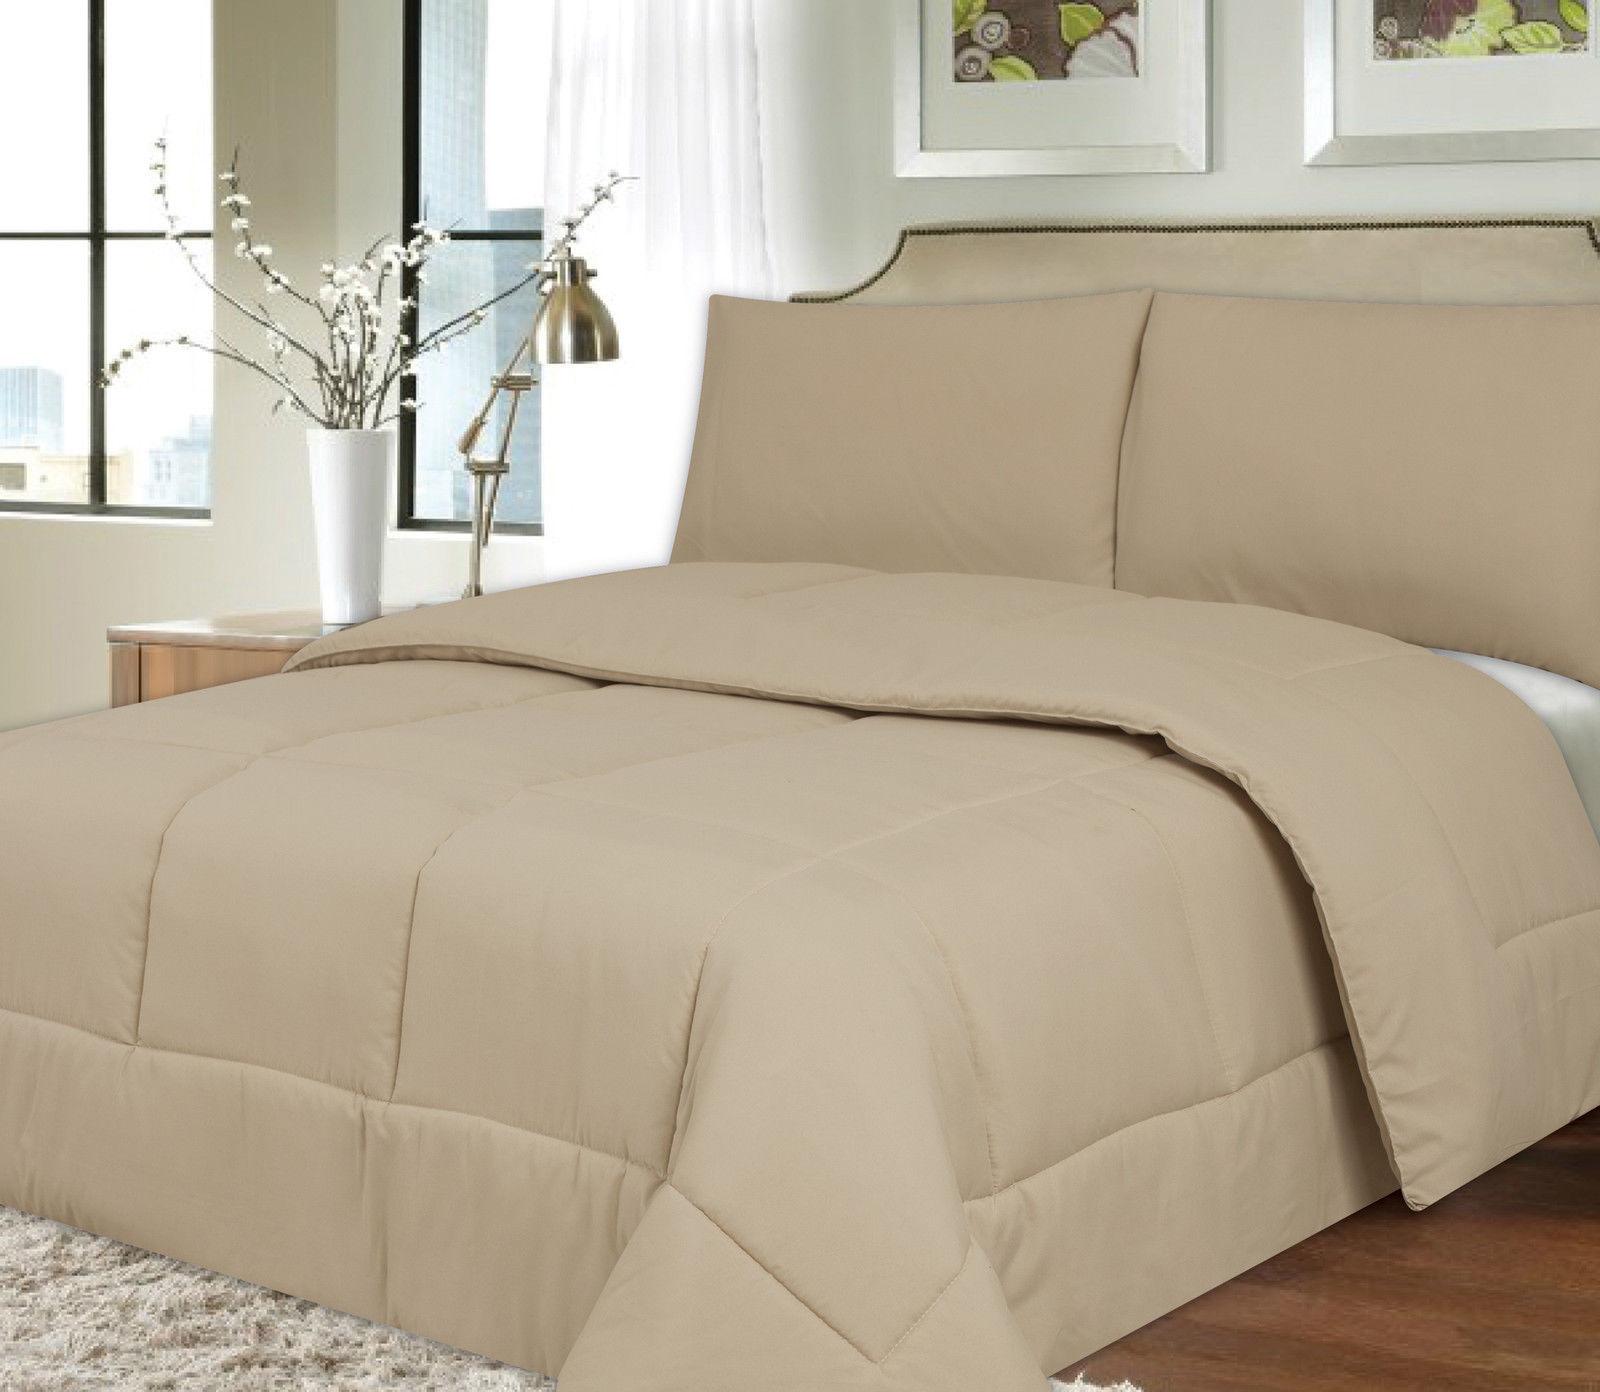 Down Alternative Polyester Comforter Box Stitch Microfiber